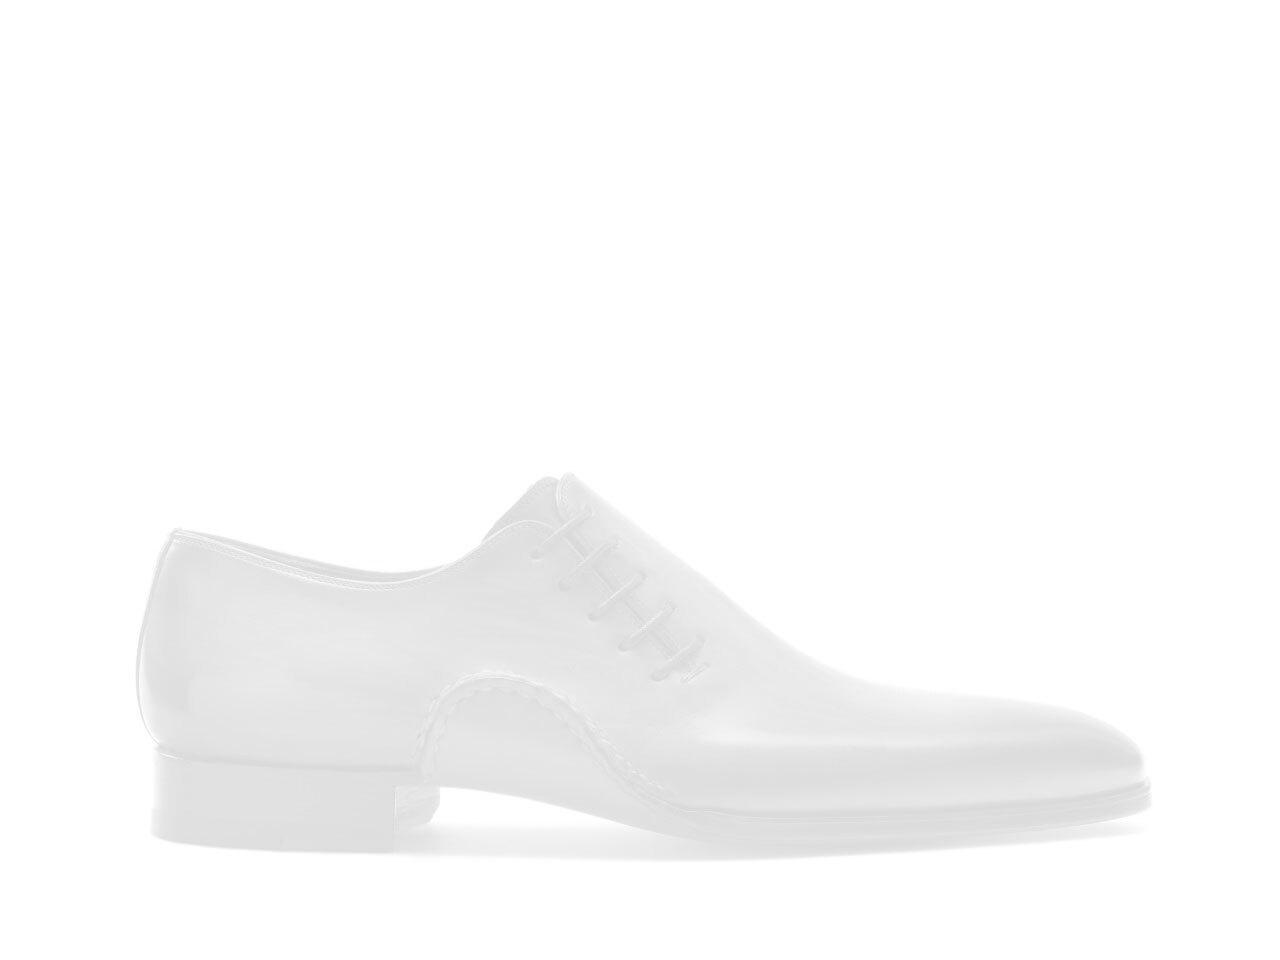 Pair of the Magnanni Nalón Black Men's Double Monk Strap Shoes